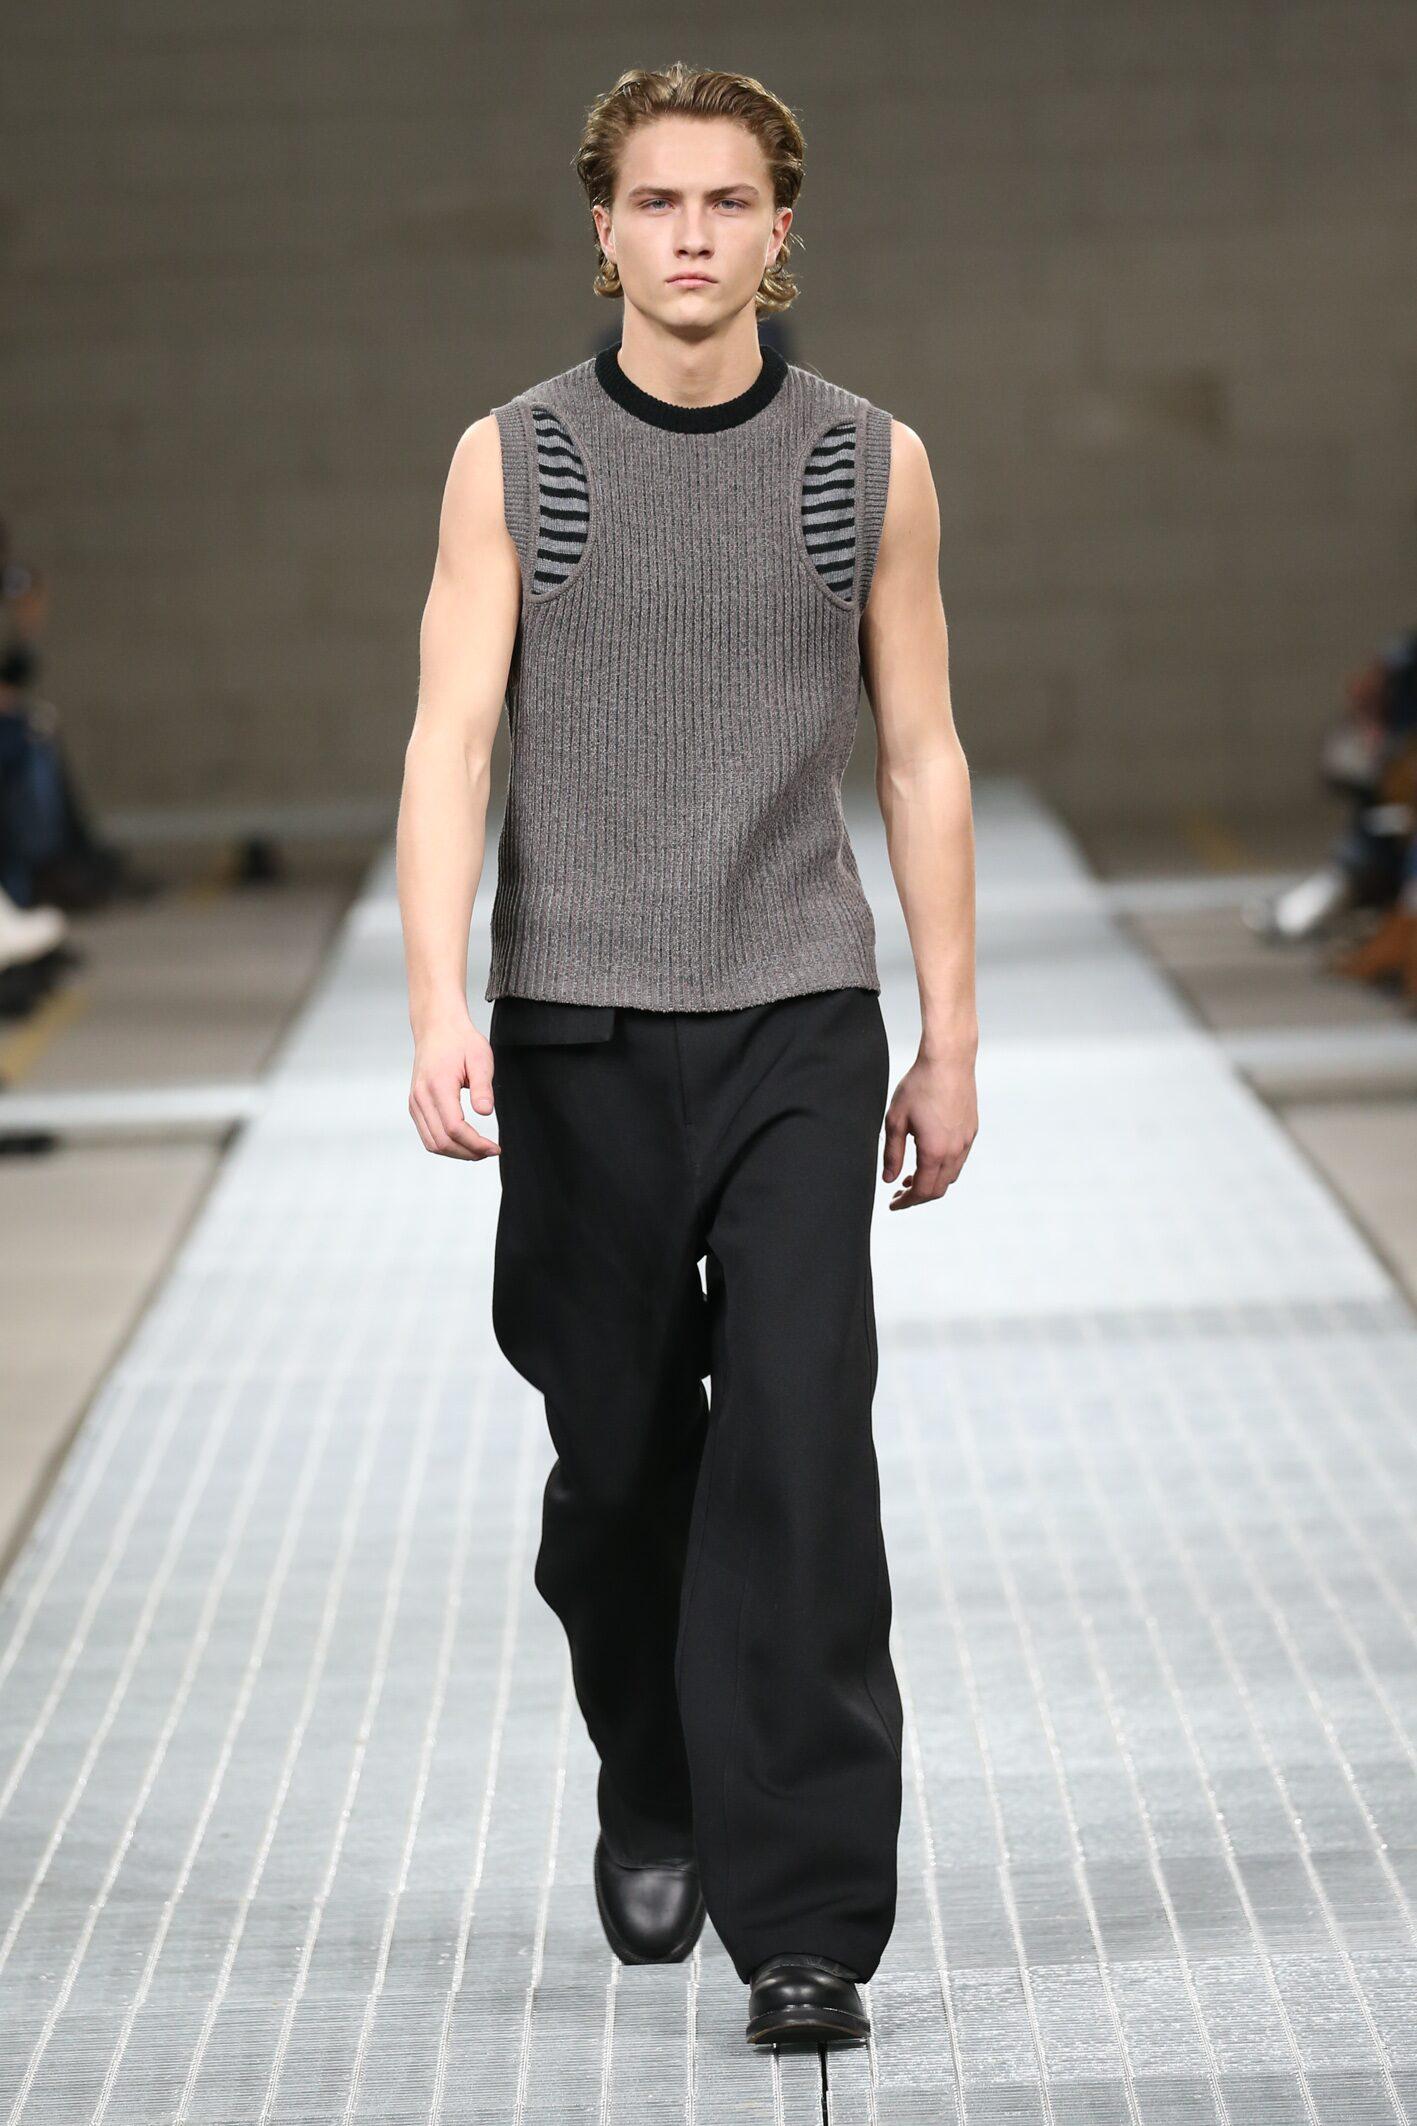 Model Fashion Show Dirk Bikkembergs